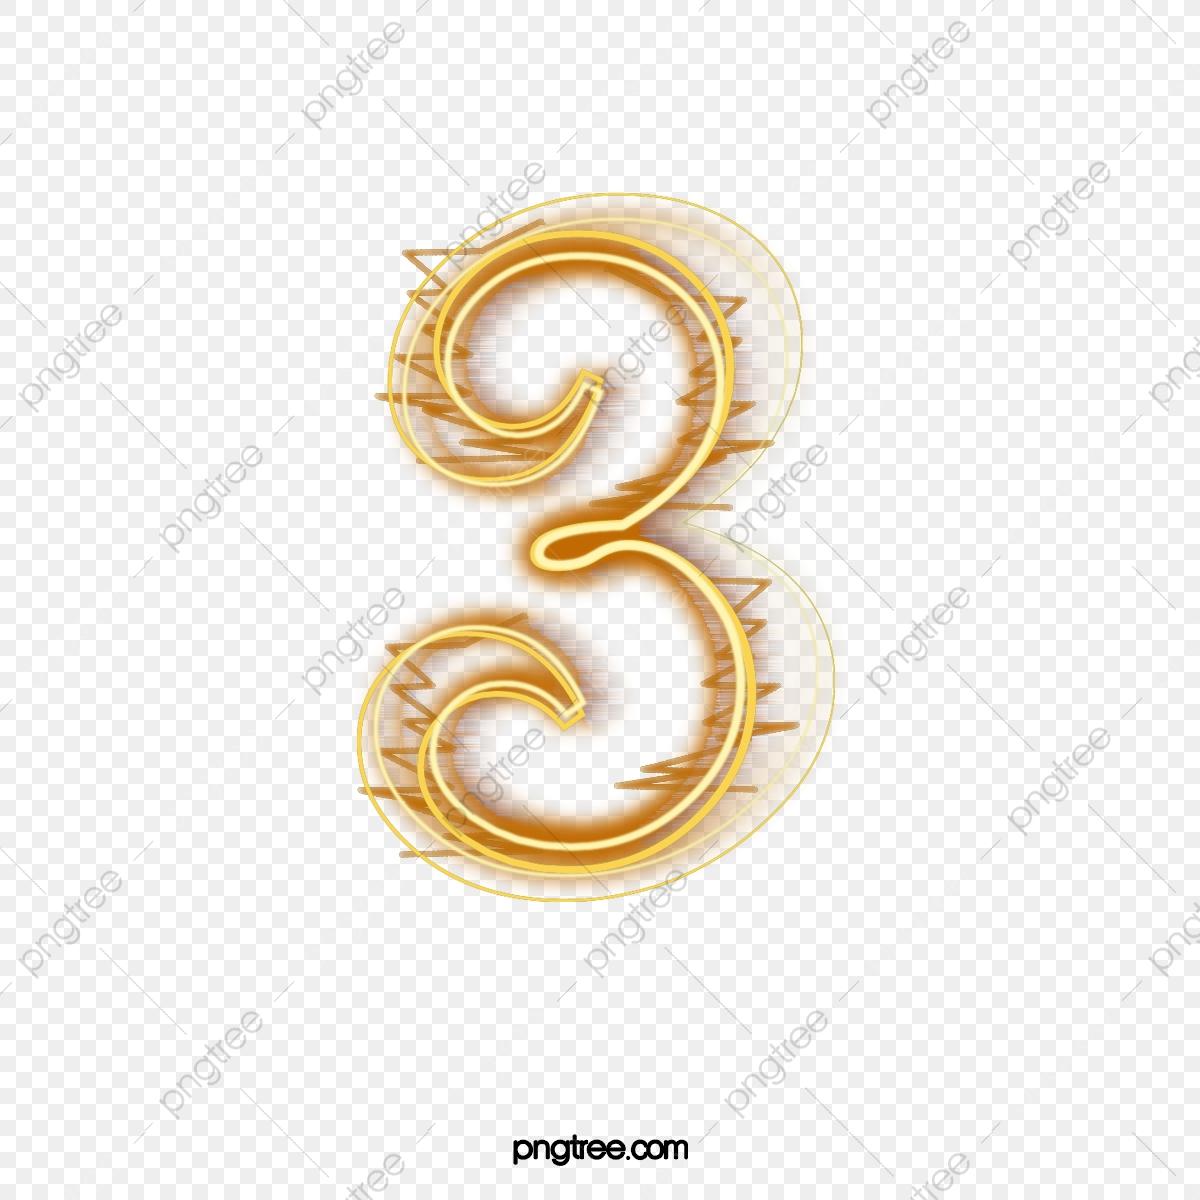 Number 3 clipart golden. Blaze white png